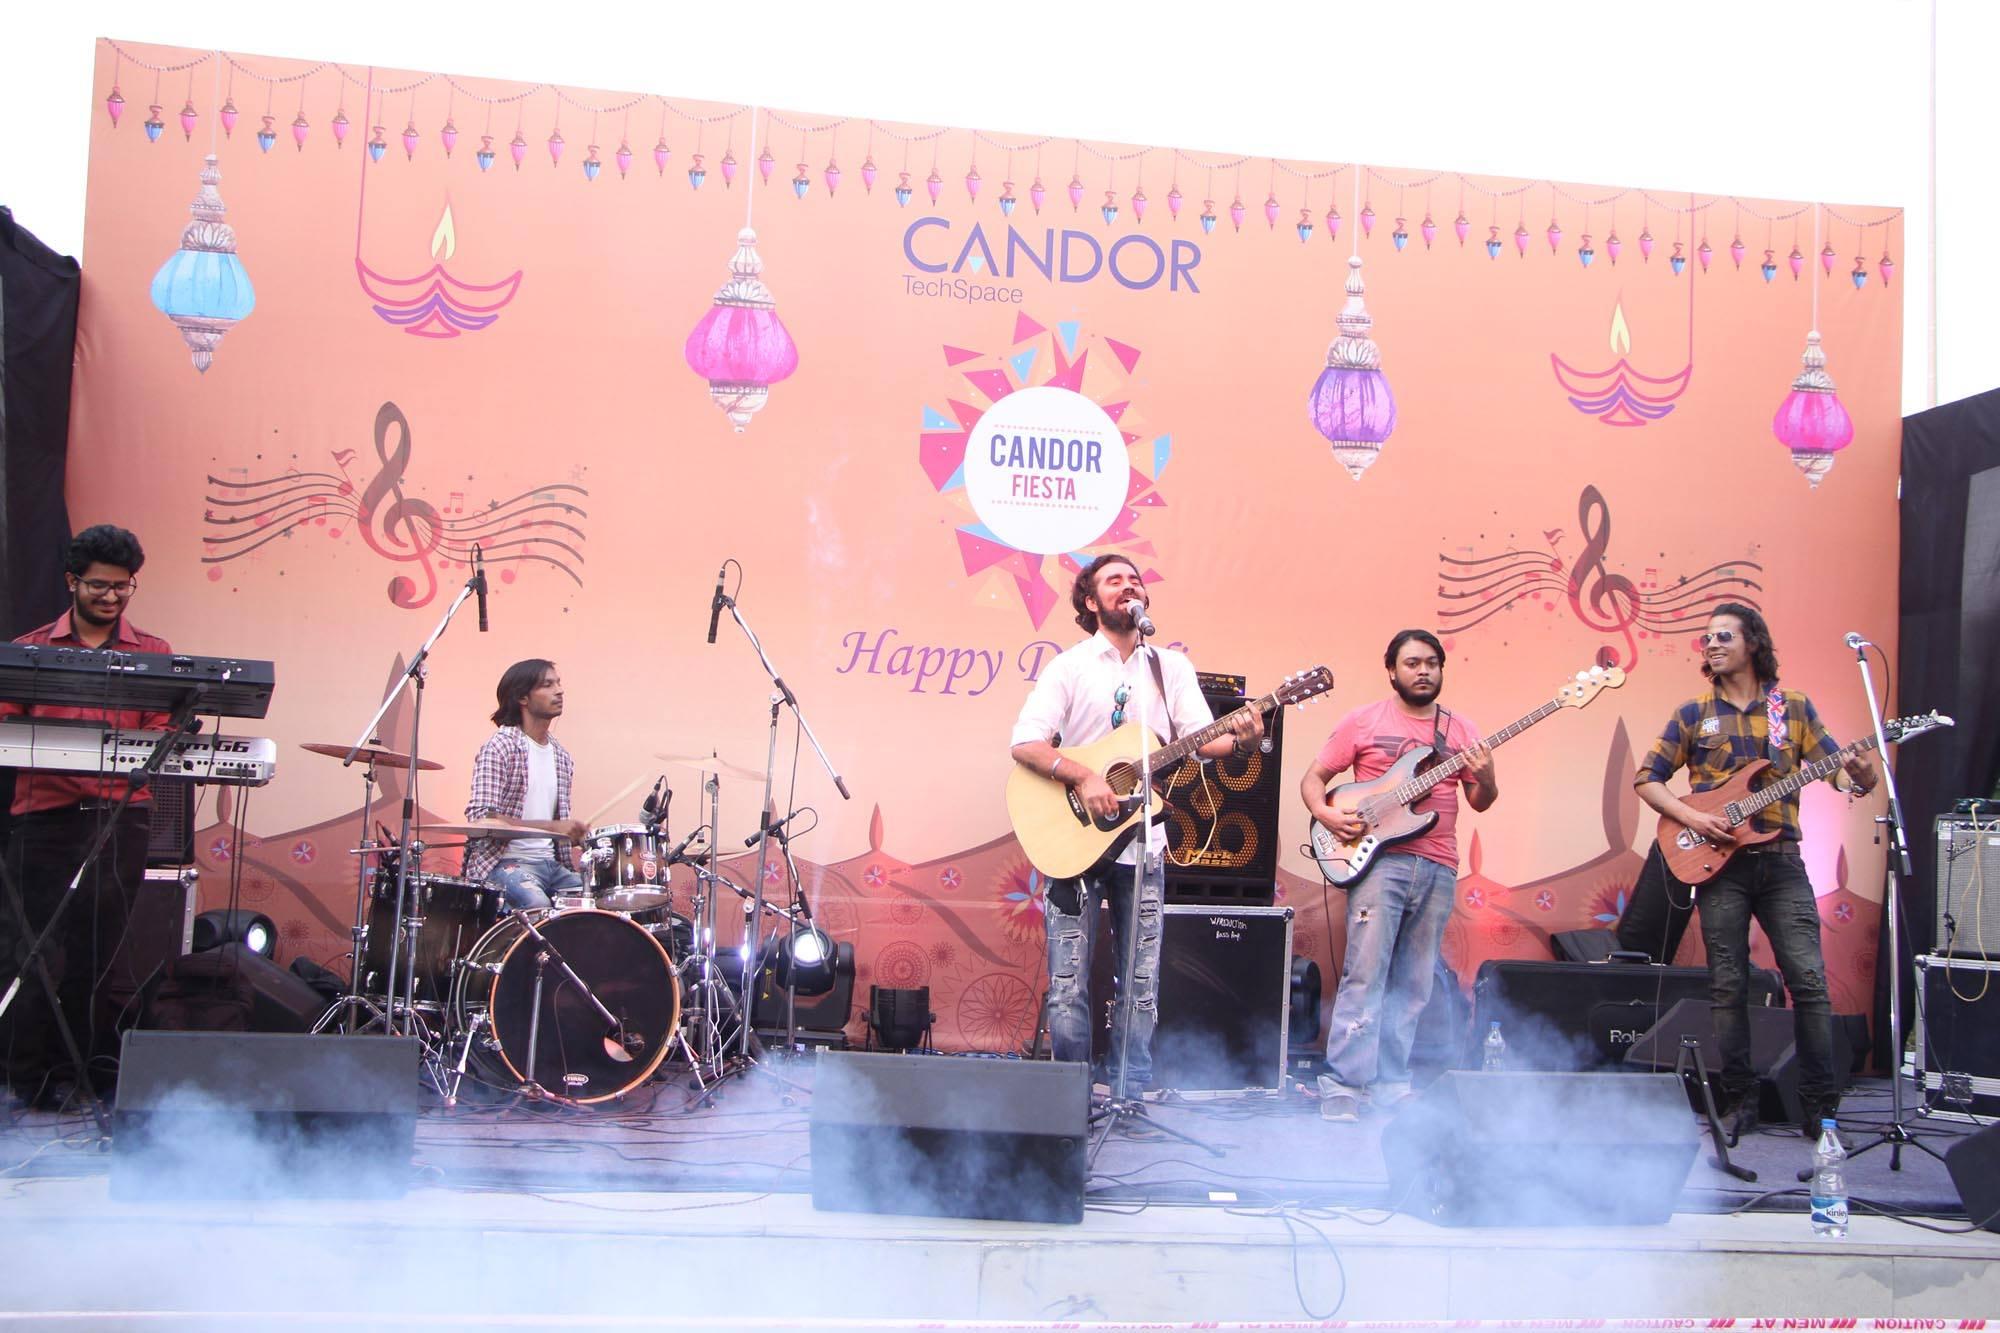 candor-diwali-Noida-135-7.jpg